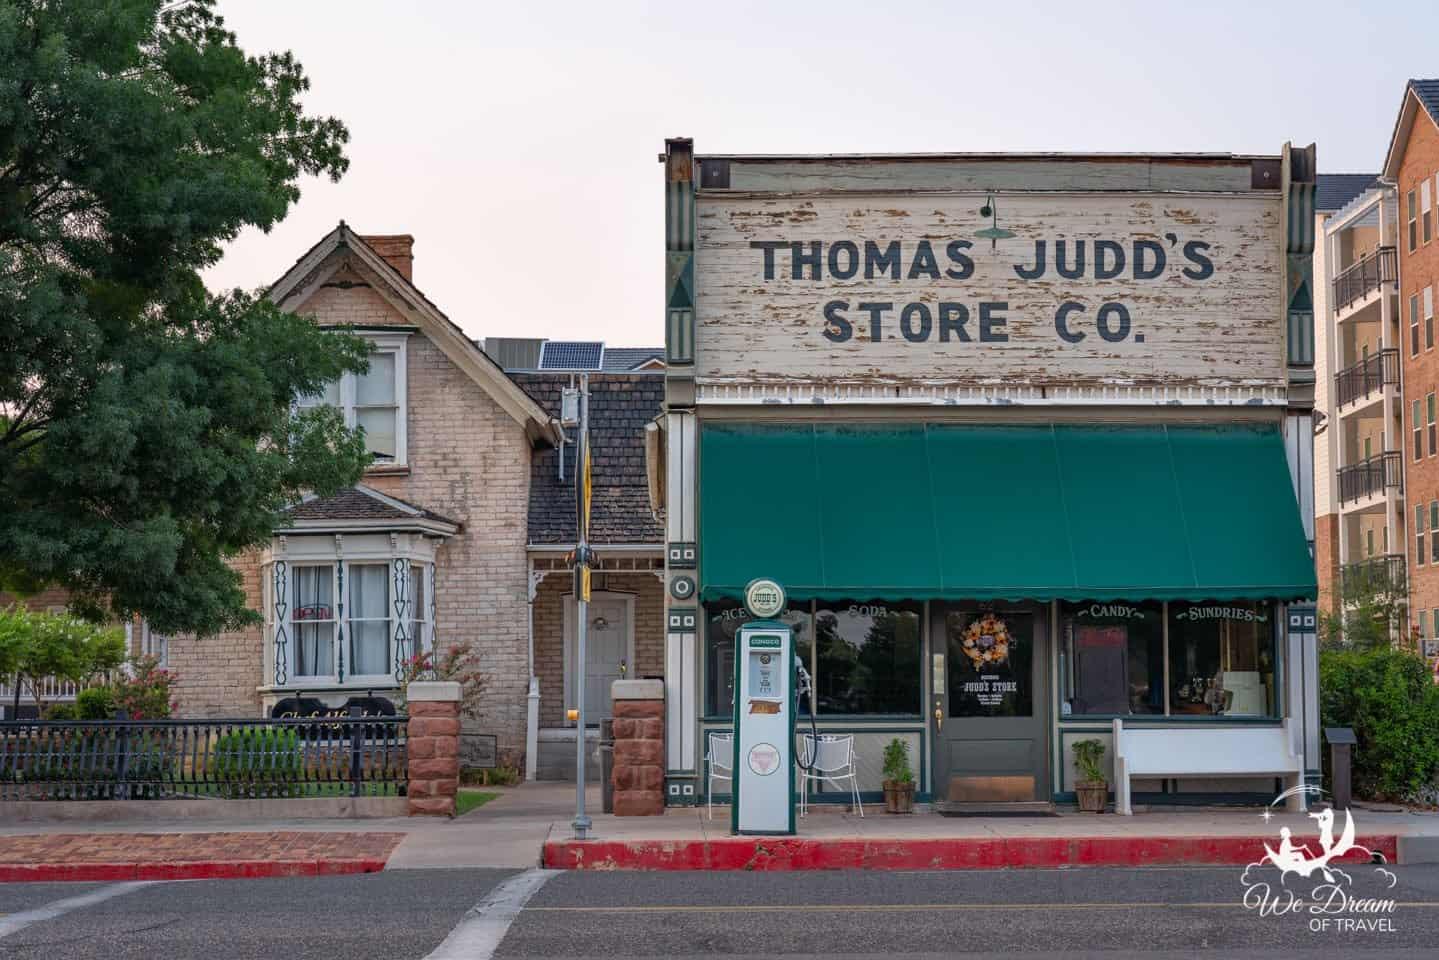 Chef Alfredo's Italian restaurant located next door to Thomas Judd's Store in St George Utah